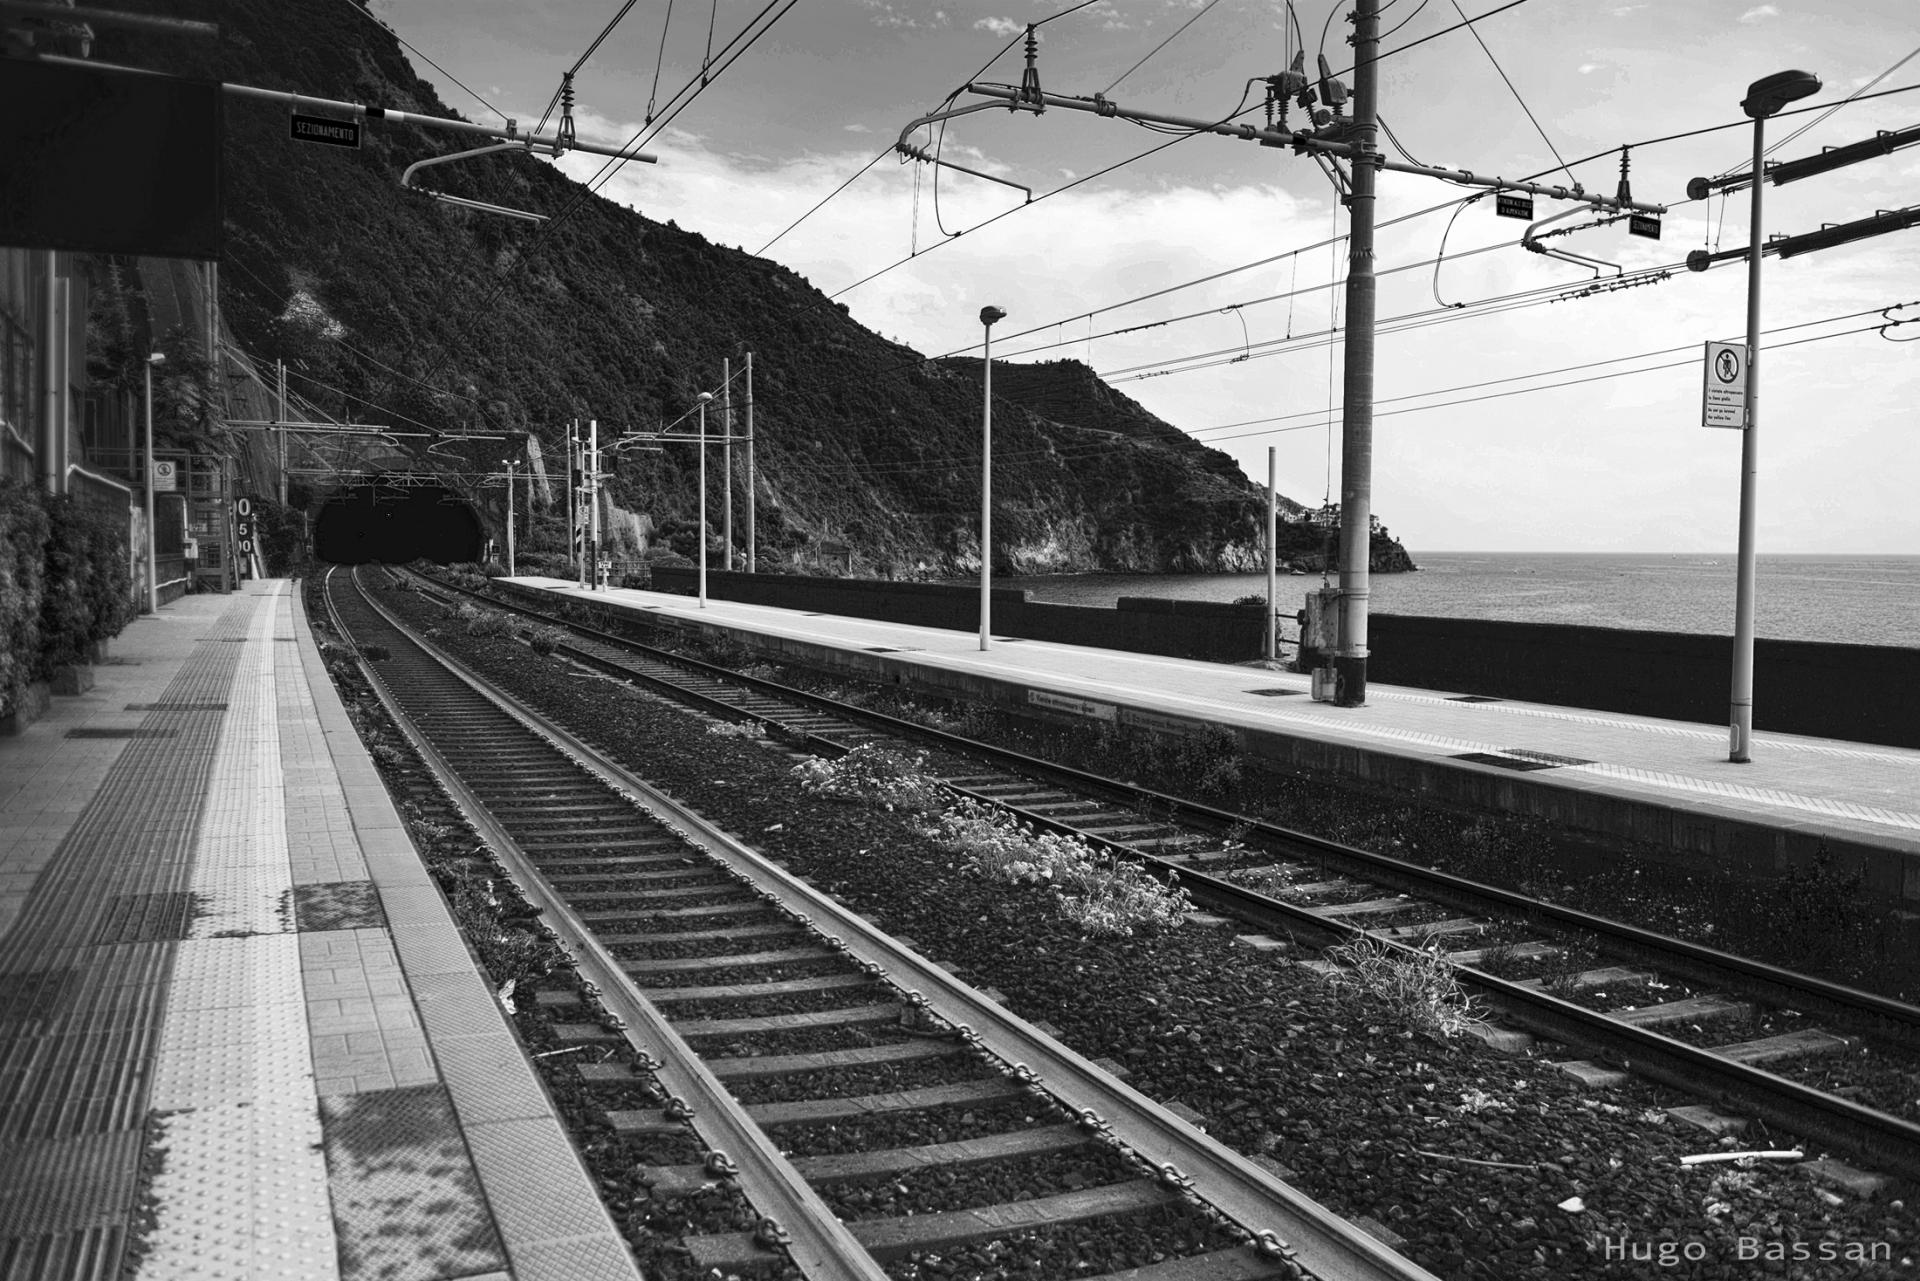 Gare de Corniglia en Italy